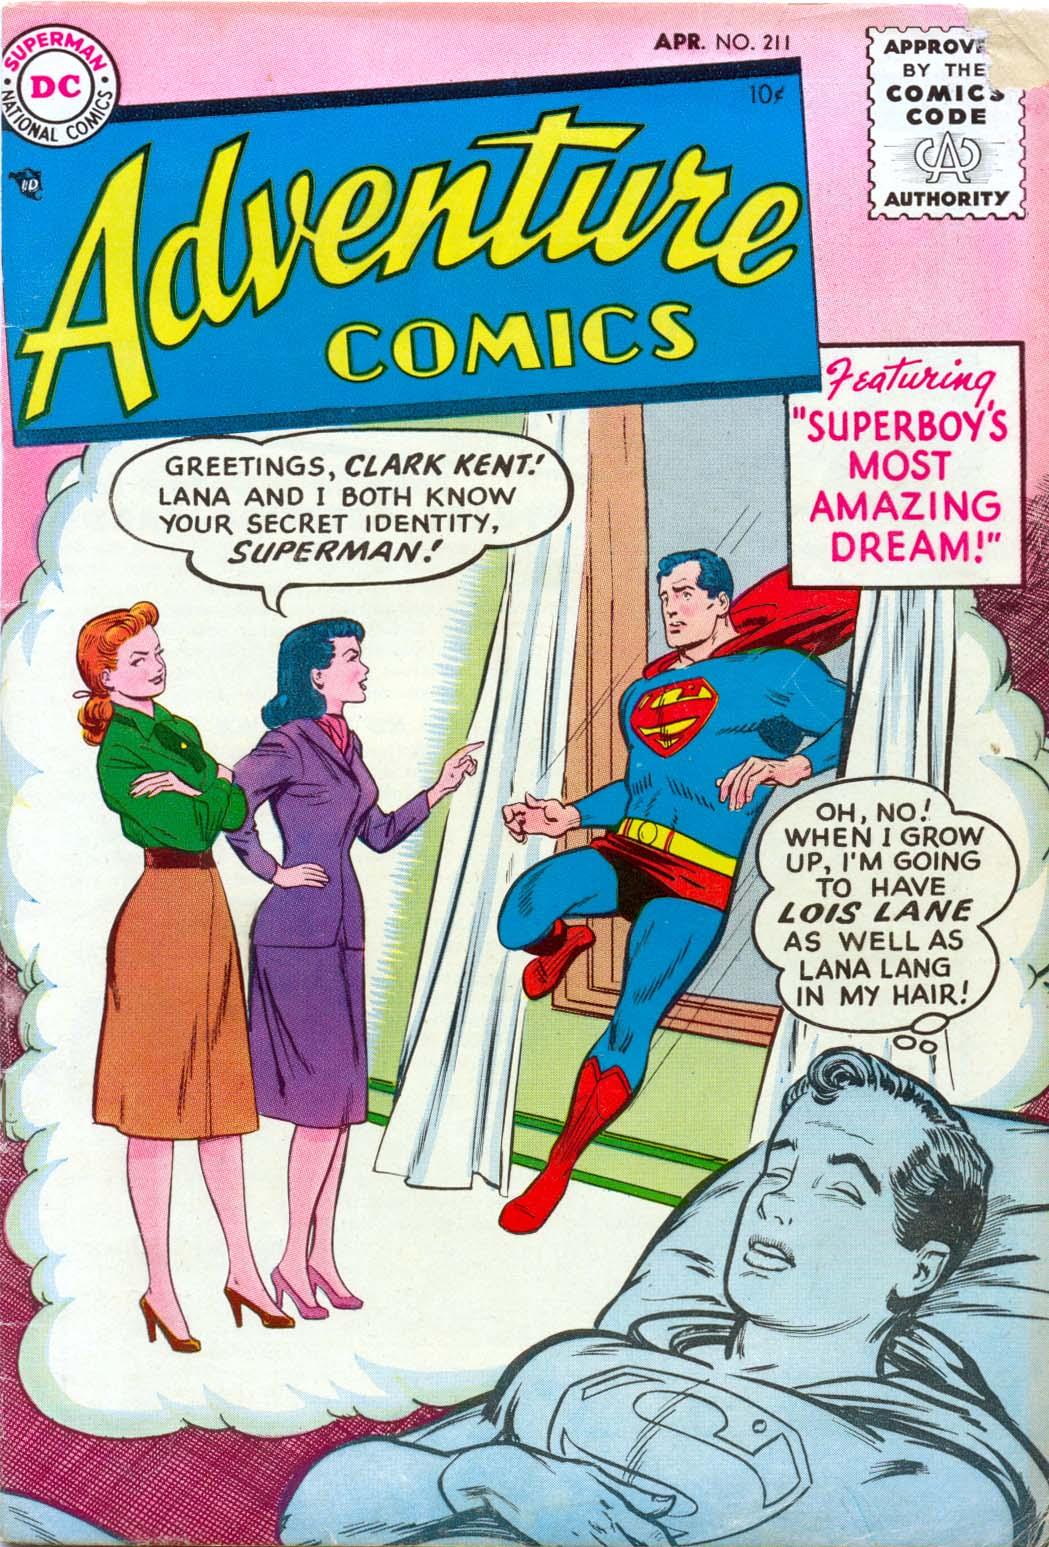 Read online Adventure Comics (1938) comic -  Issue #211 - 1